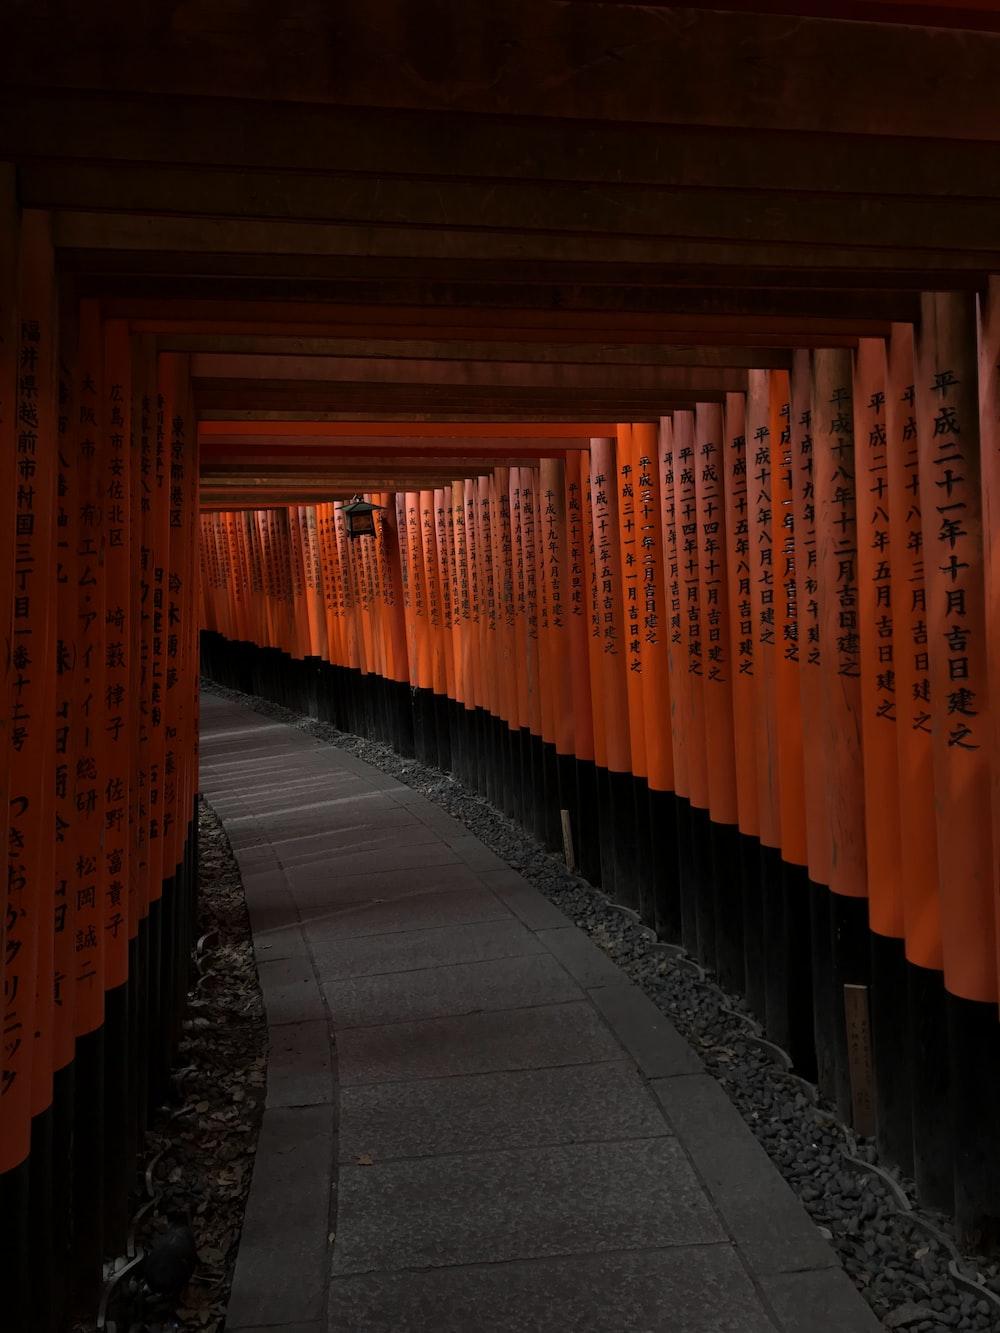 orange and black wooden posts